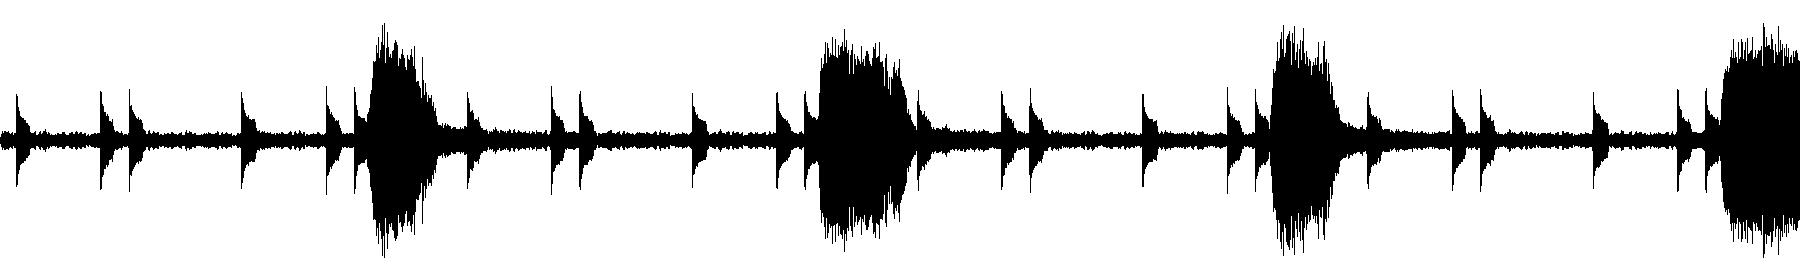 vedh melodyloop 035 am d em bm 125bpm